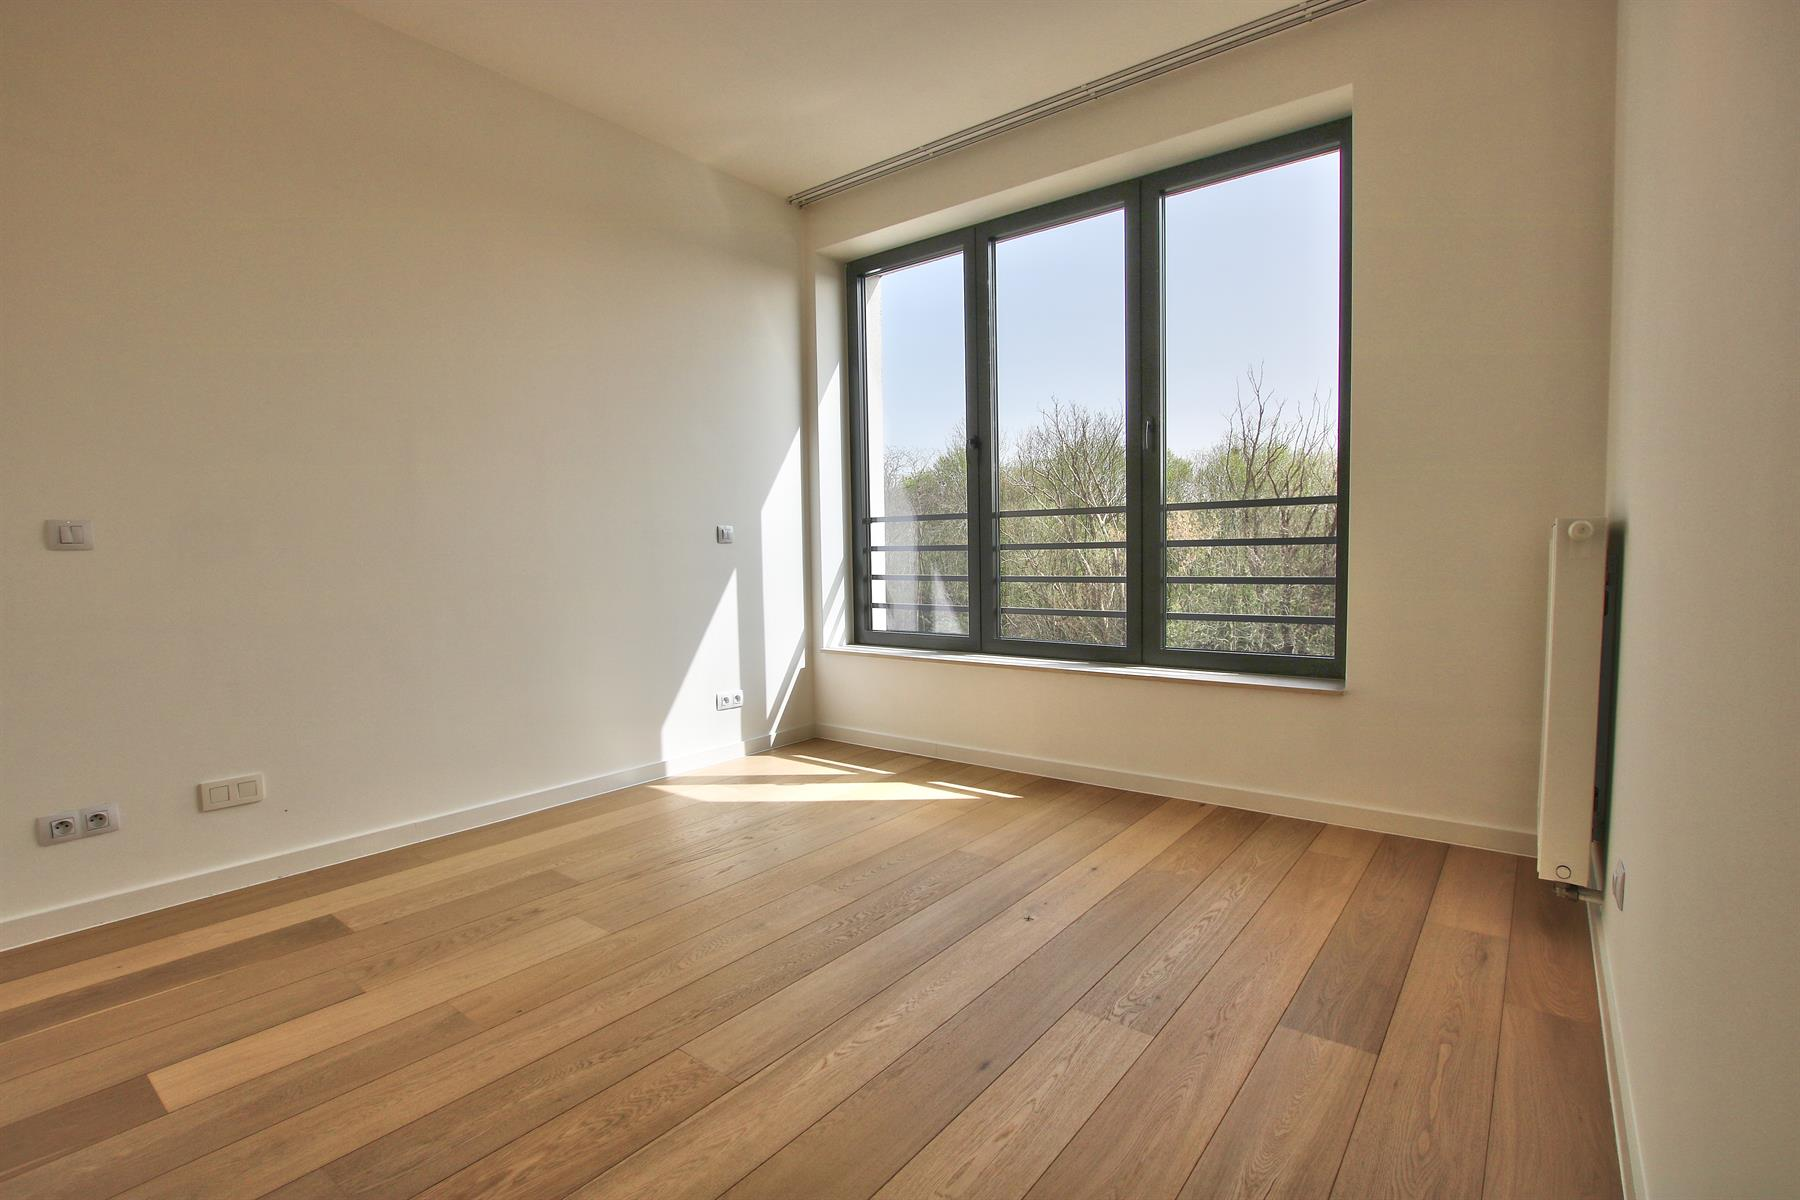 Appartement - Woluwe-Saint-Lambert - #4324368-20